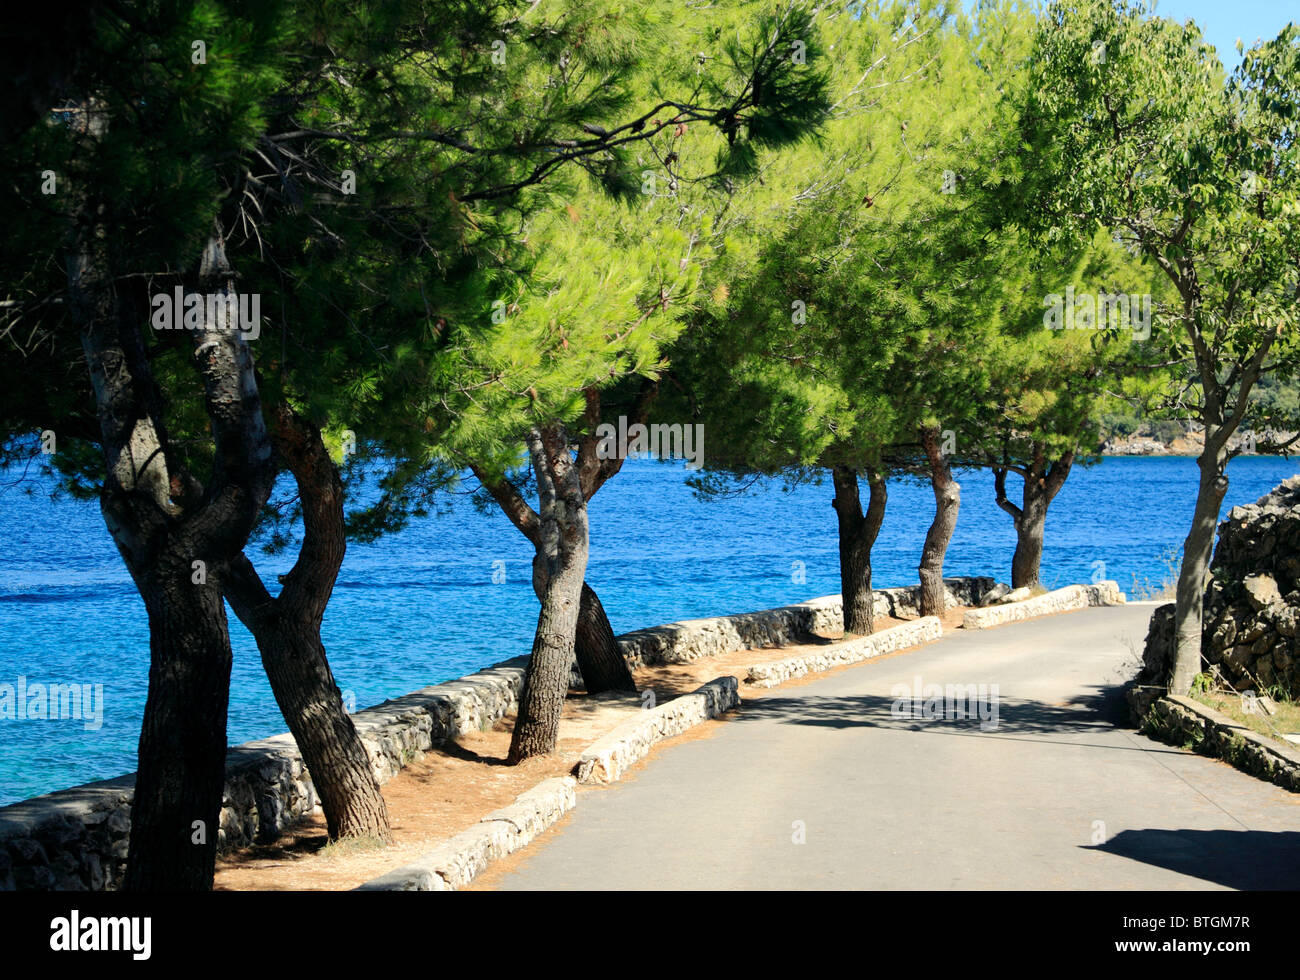 Promenade in Valun village on Cres Island, Croatia Stock Photo